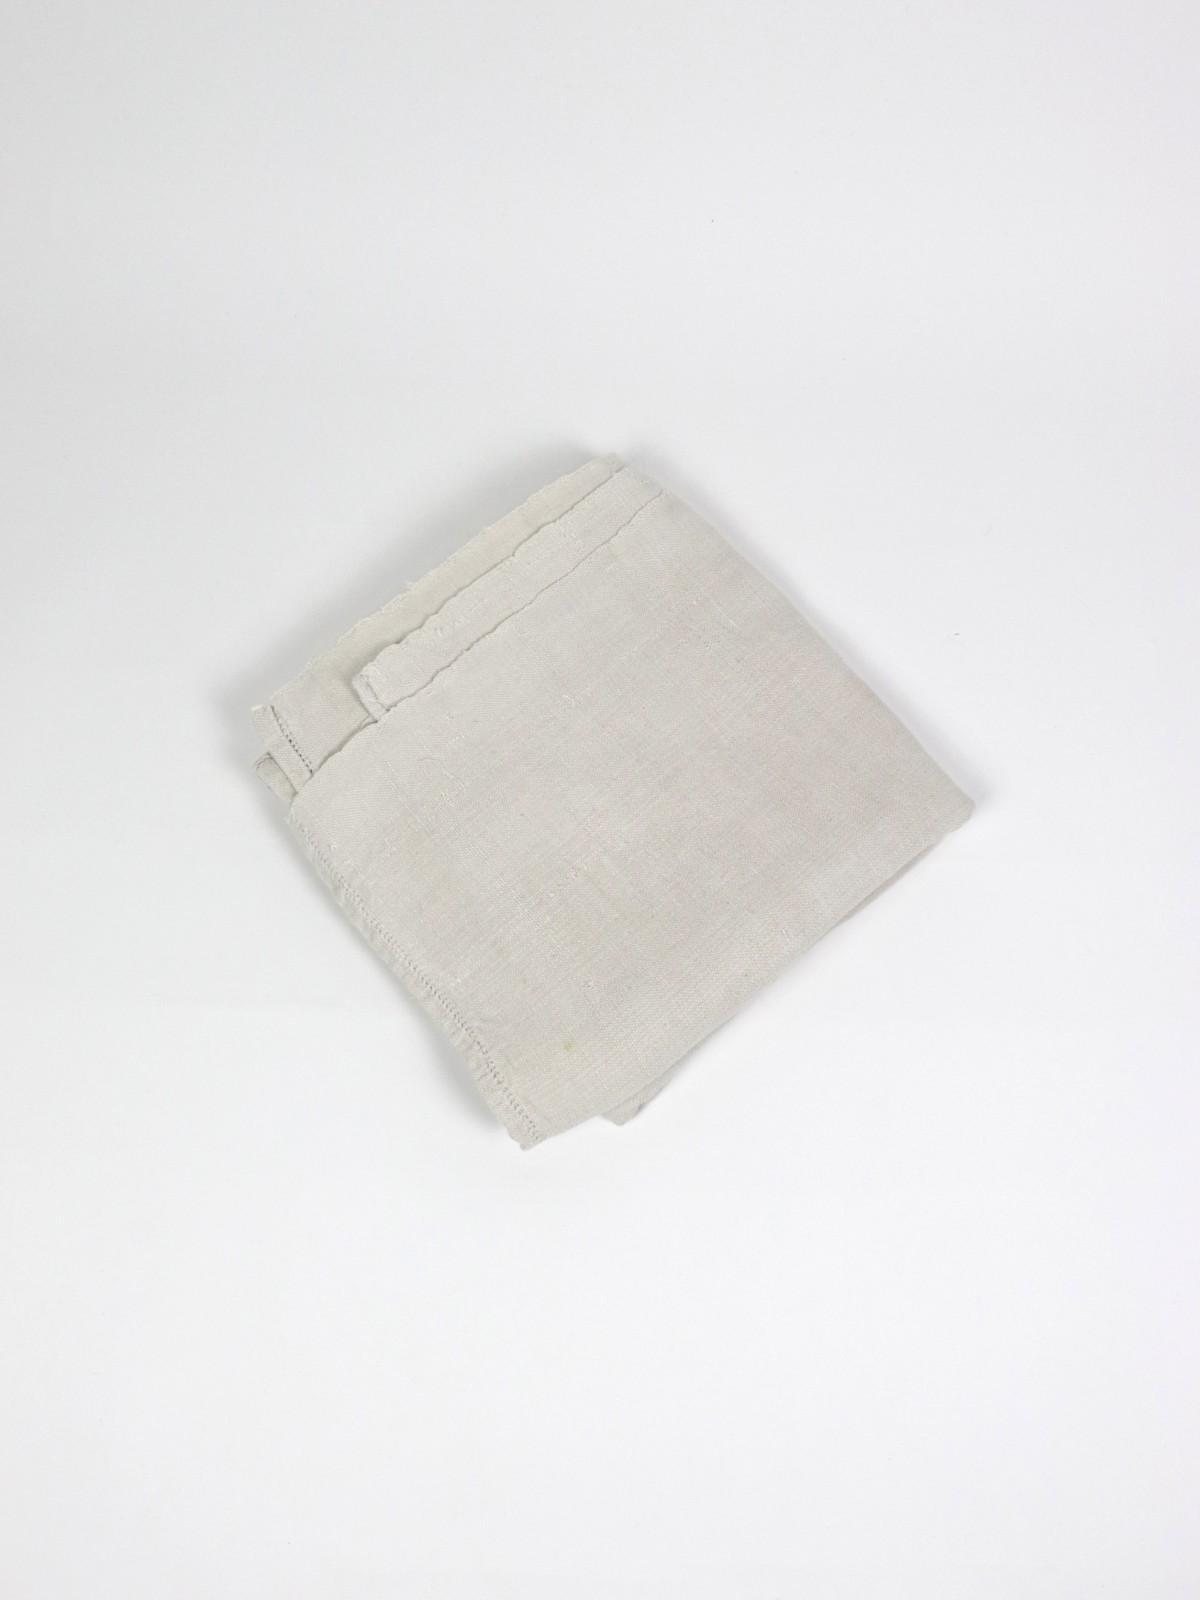 Hungarian linen, fabric